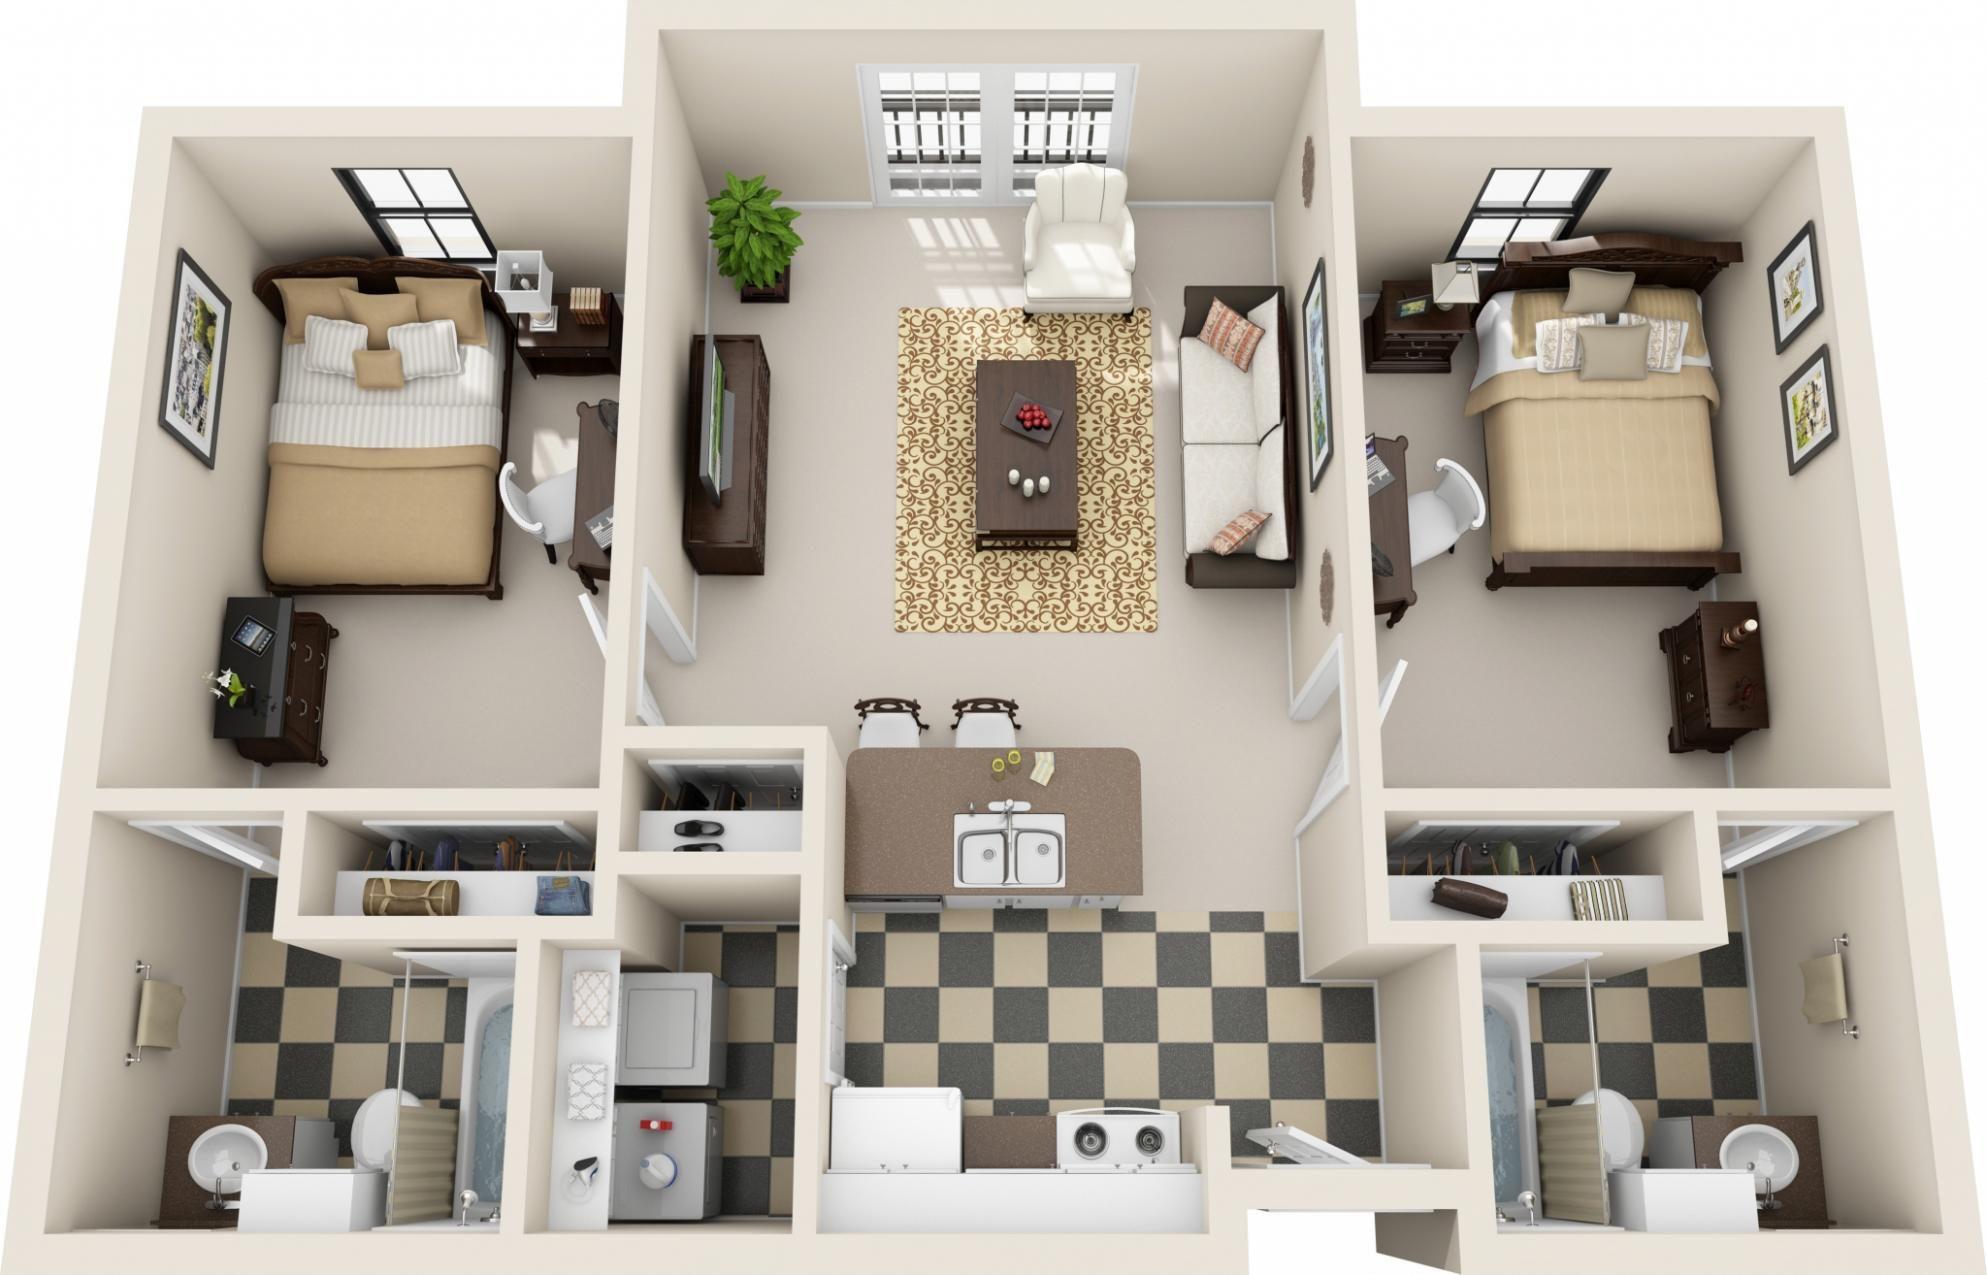 Bed 2 Bath 830 Sq Ft Floor Plan 2 Bedroom Apartment One